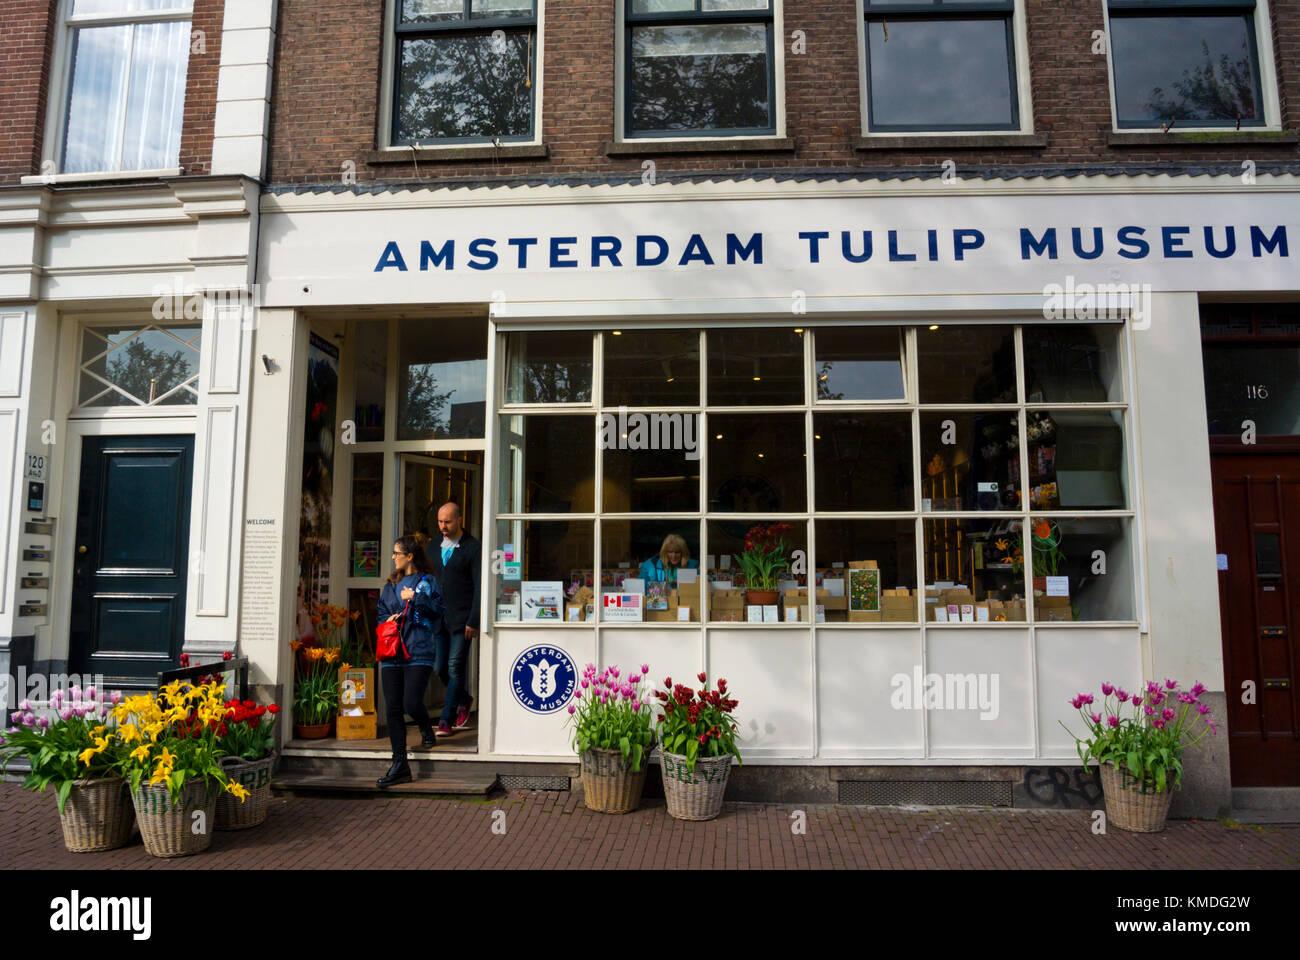 Tulip museum, Prinsengracht, Jordaan, Amsterdam, The Netherlands - Stock Image